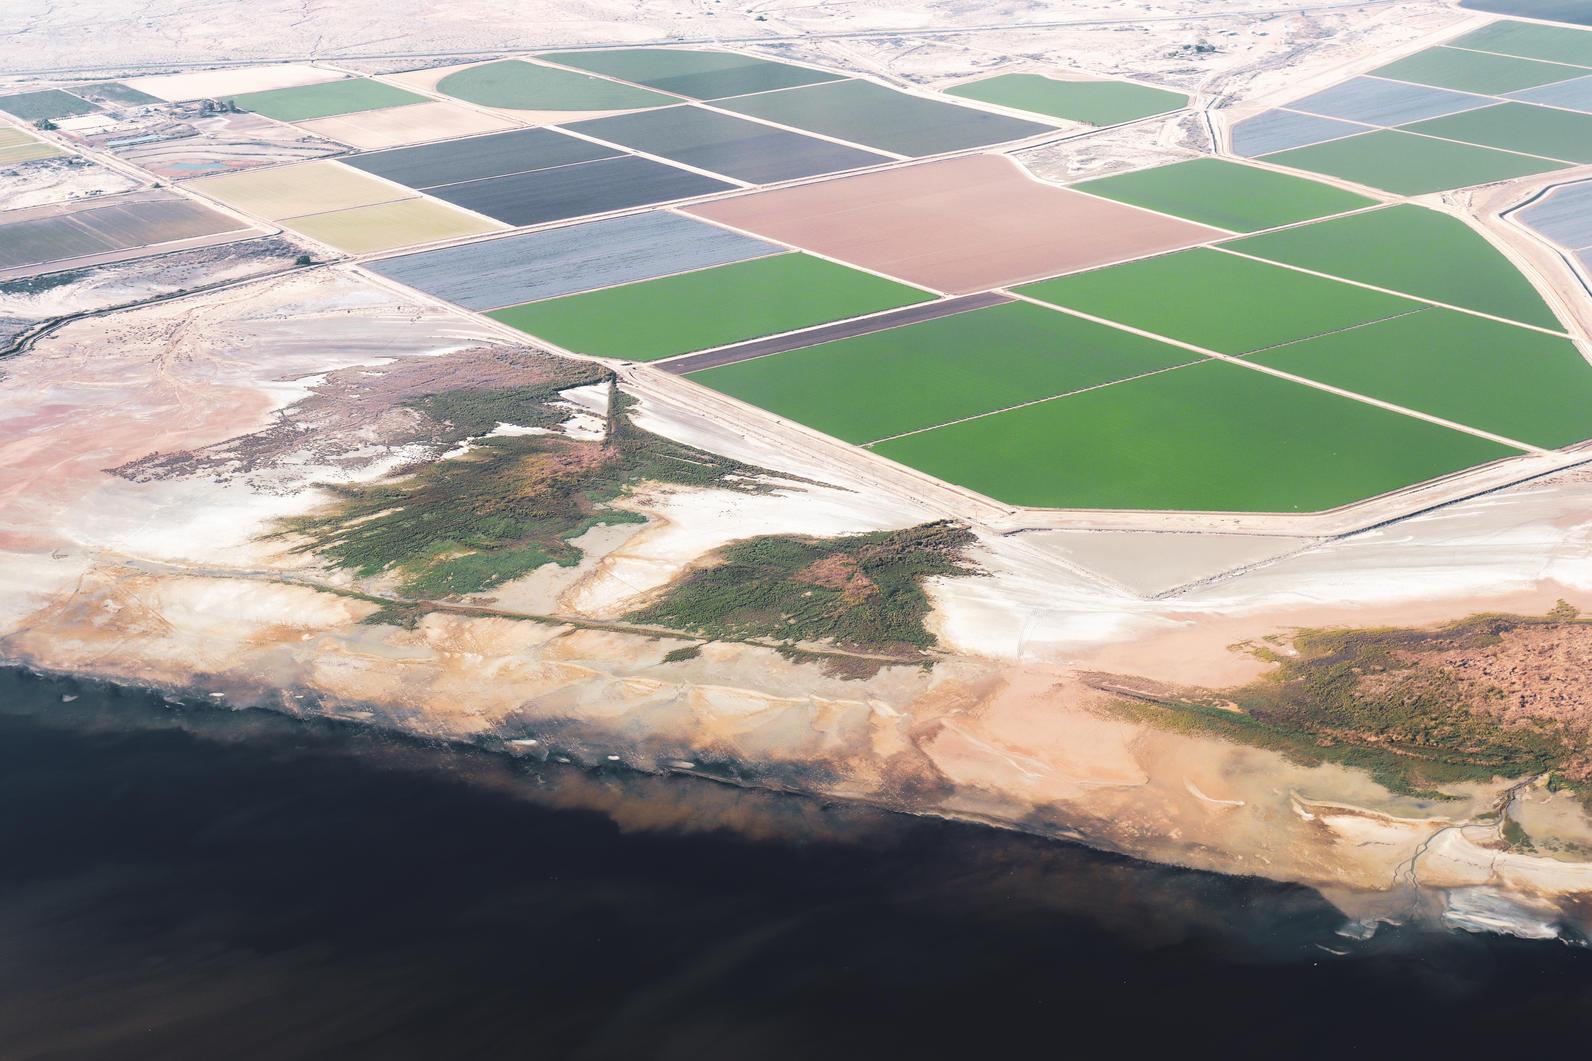 Emerging Wetlands at the Salton Sea